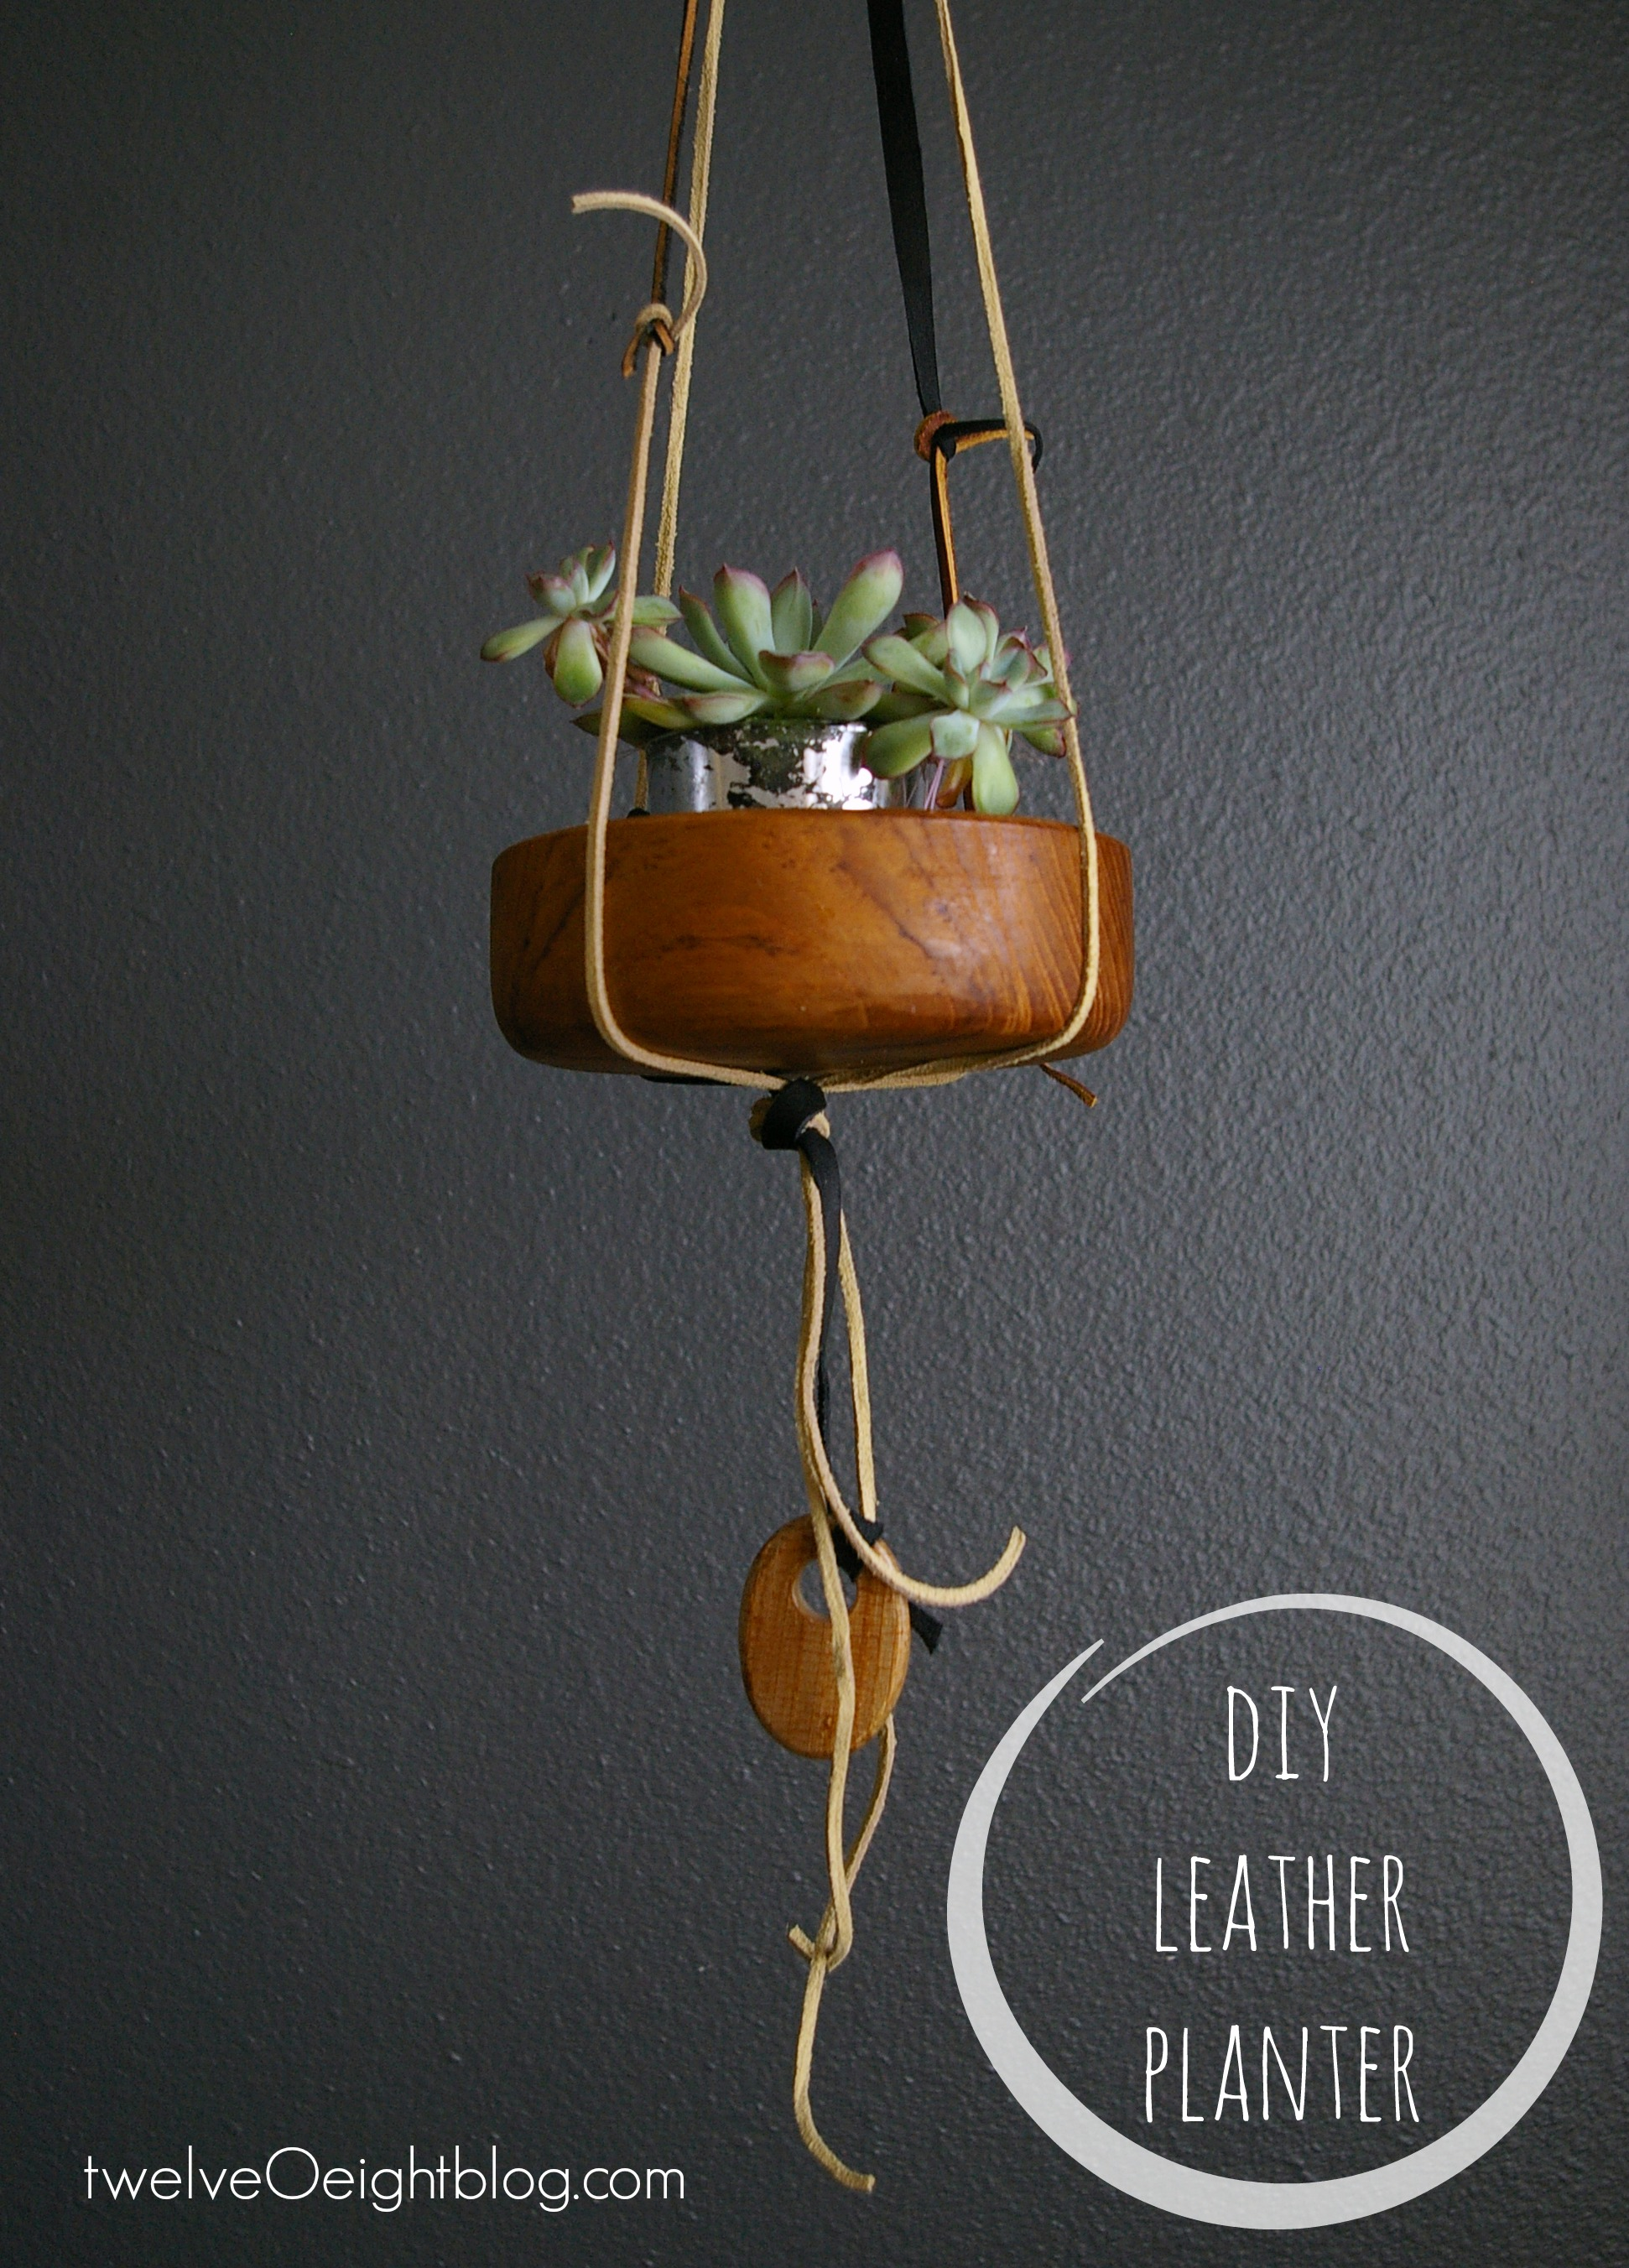 DIY Leather Planter TwelveOeightblog Leatherplanter Modernplanter ...